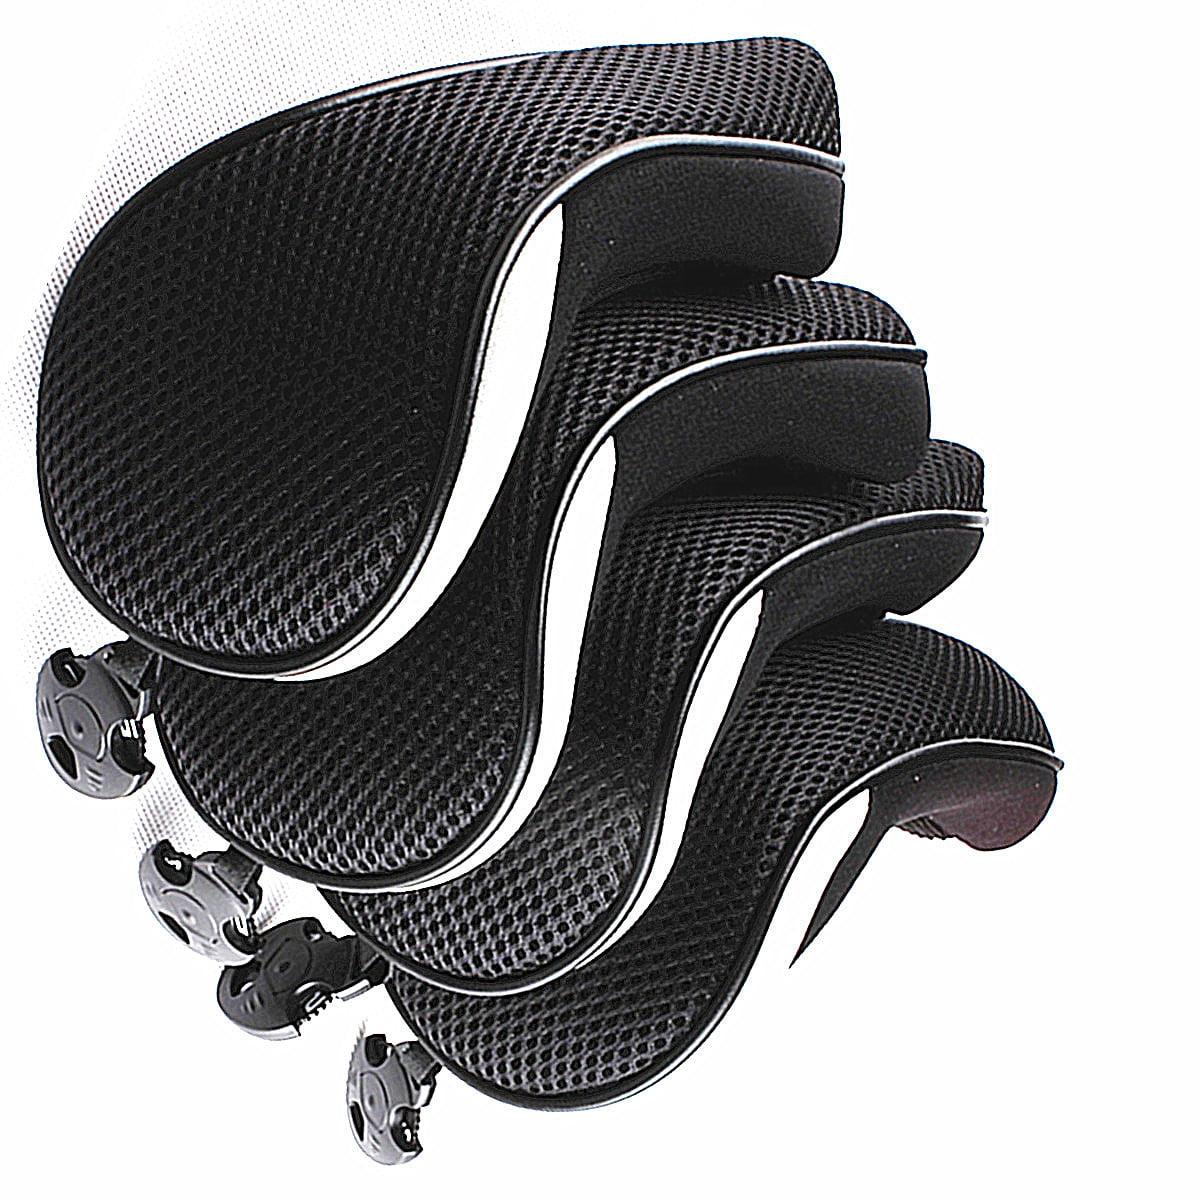 4PCS Thick Neoprene Hybrid Golf Club Head Cover Headcovers Gray